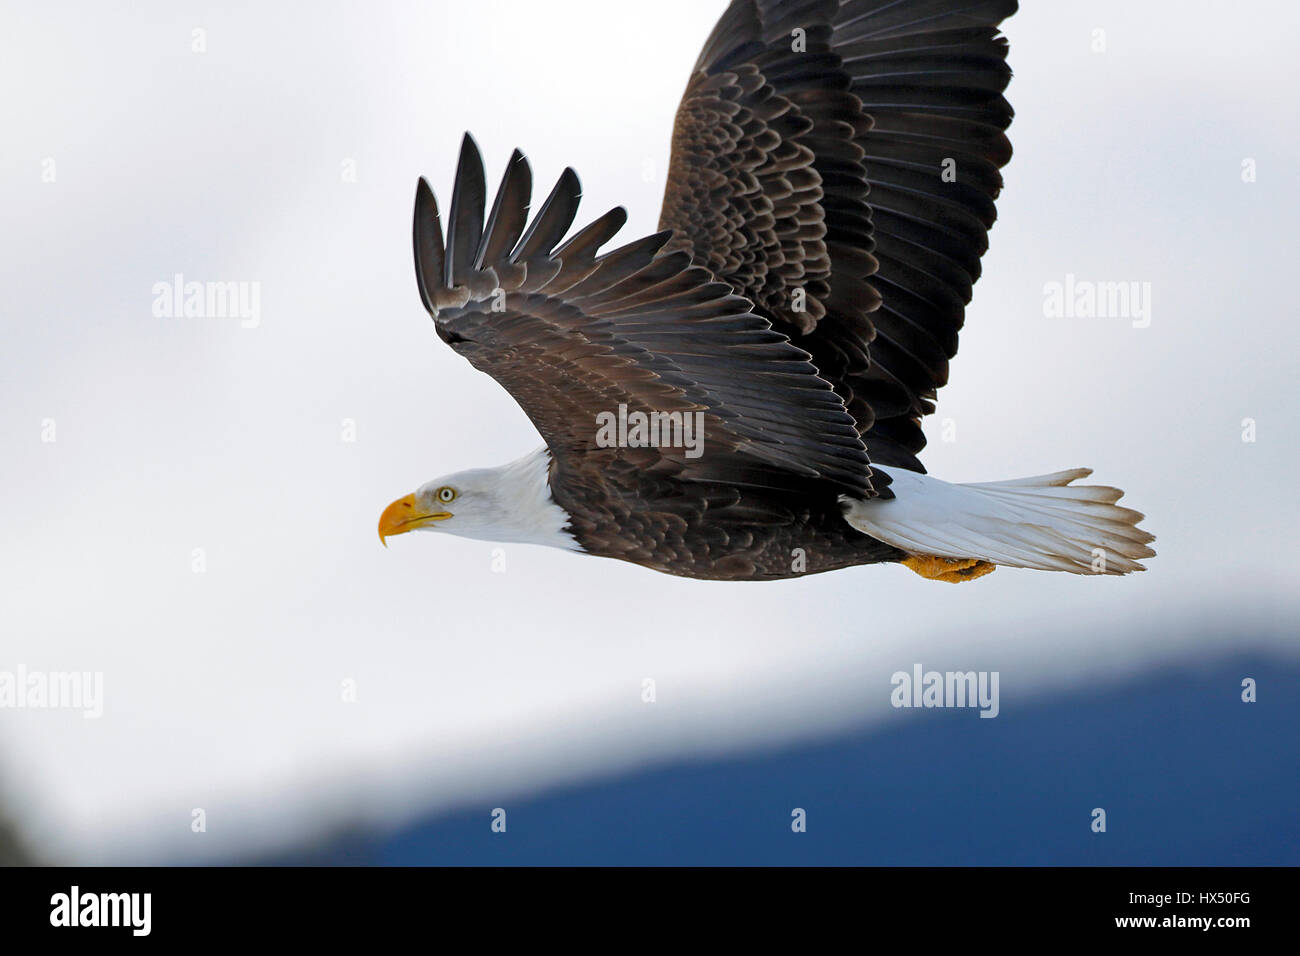 American Bald Eagle in flight, in cloudy winter sky, Stock Photo